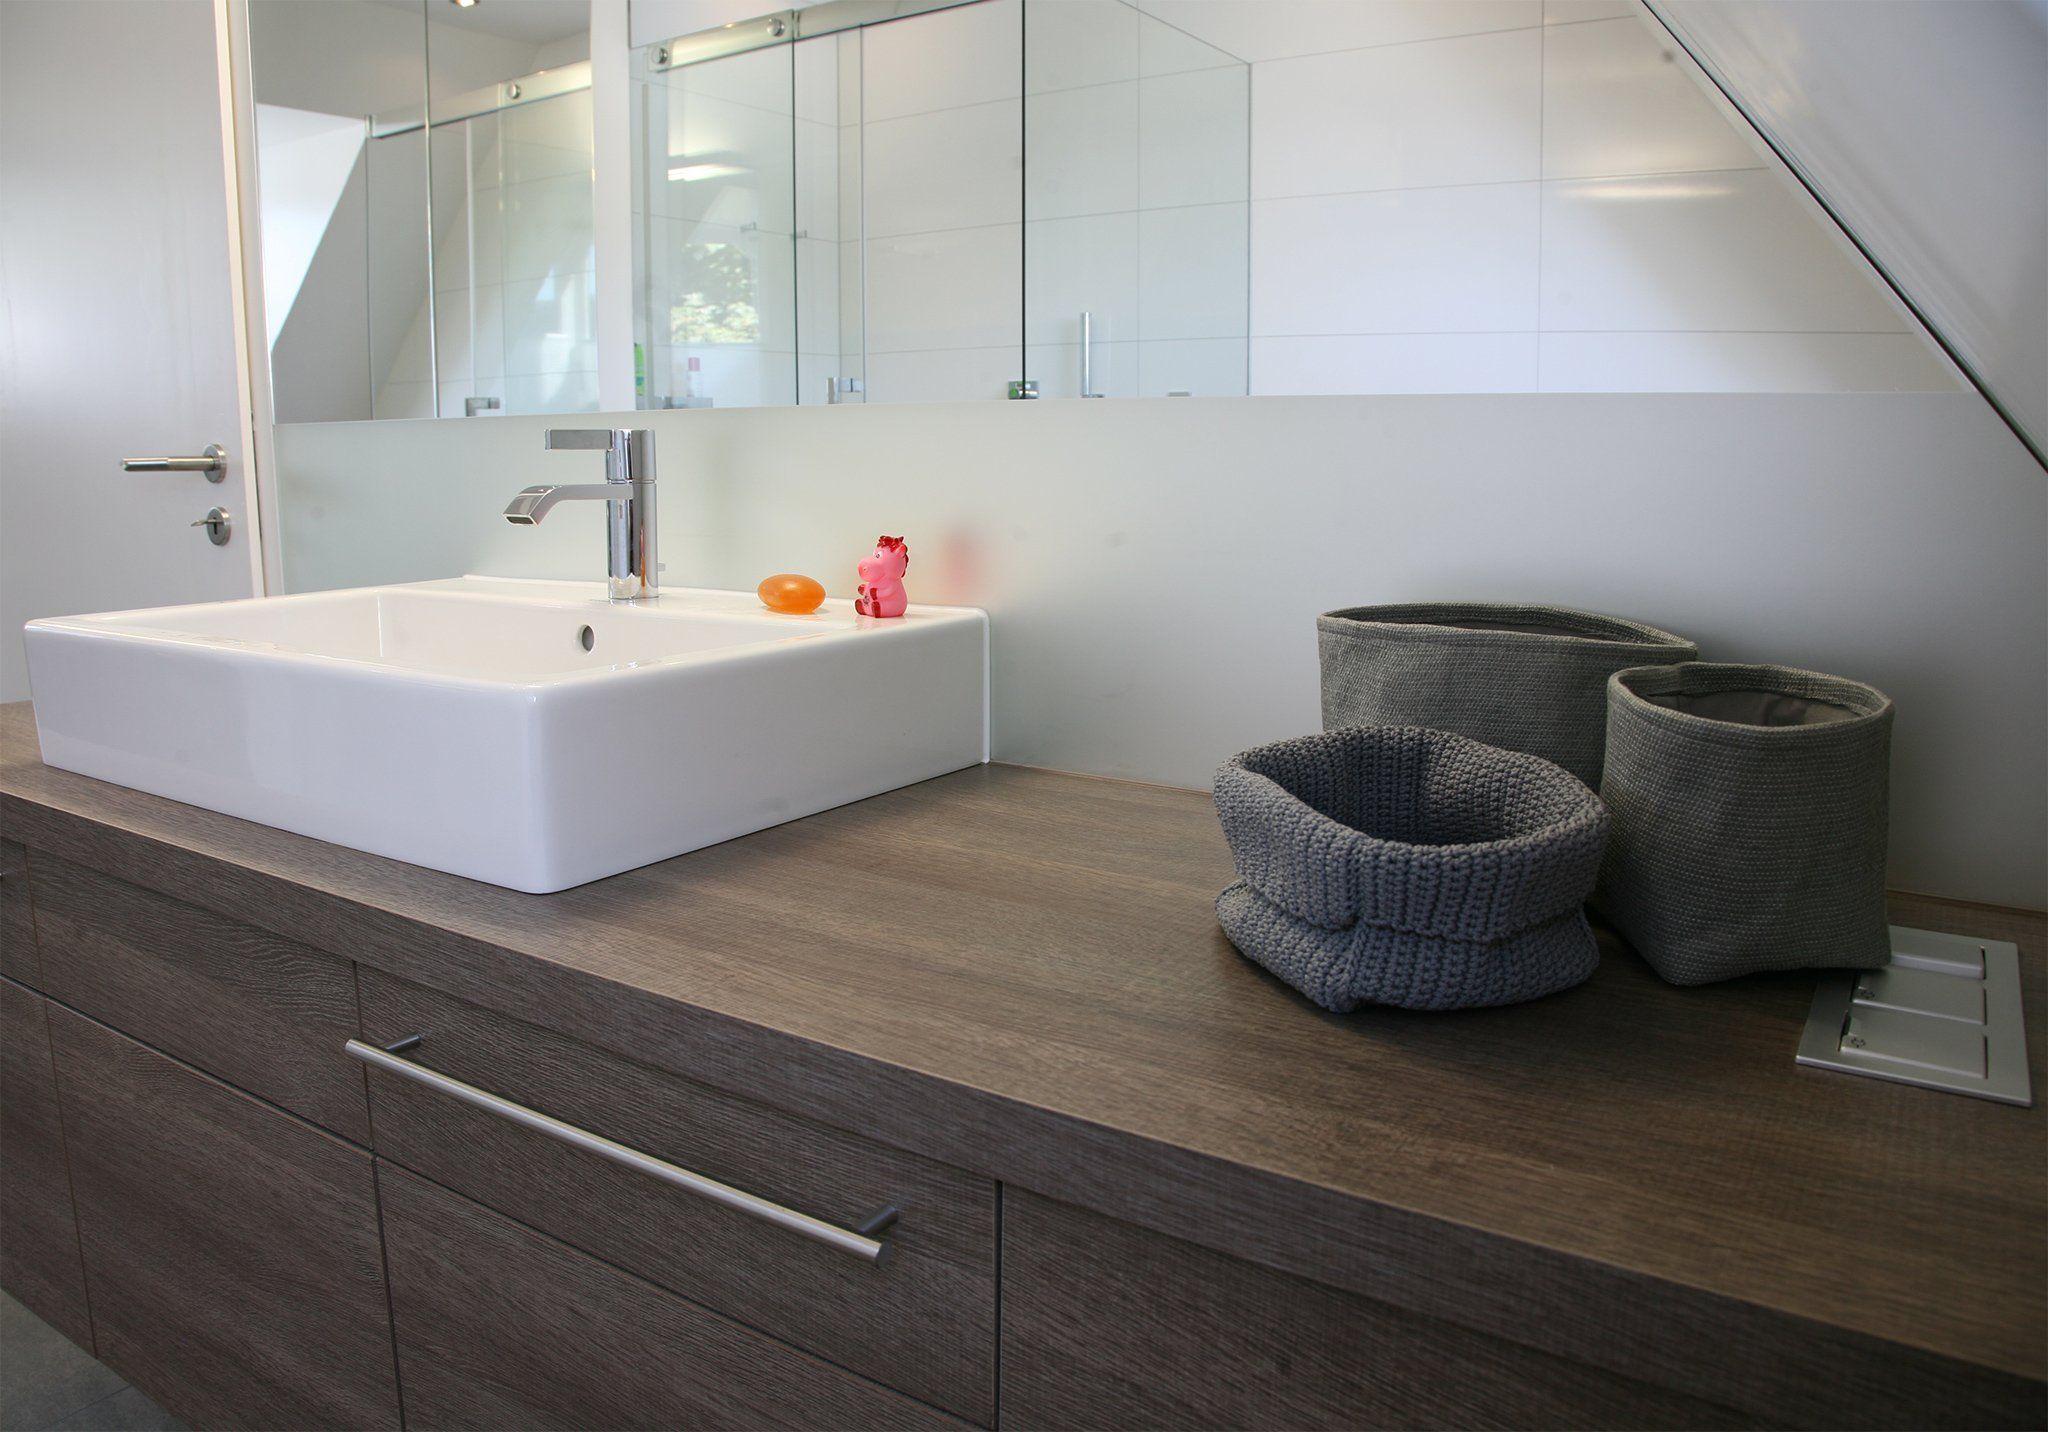 Ebenerdige Dusche In Modernem Bad Rawe Gmbh In 2018 Bader